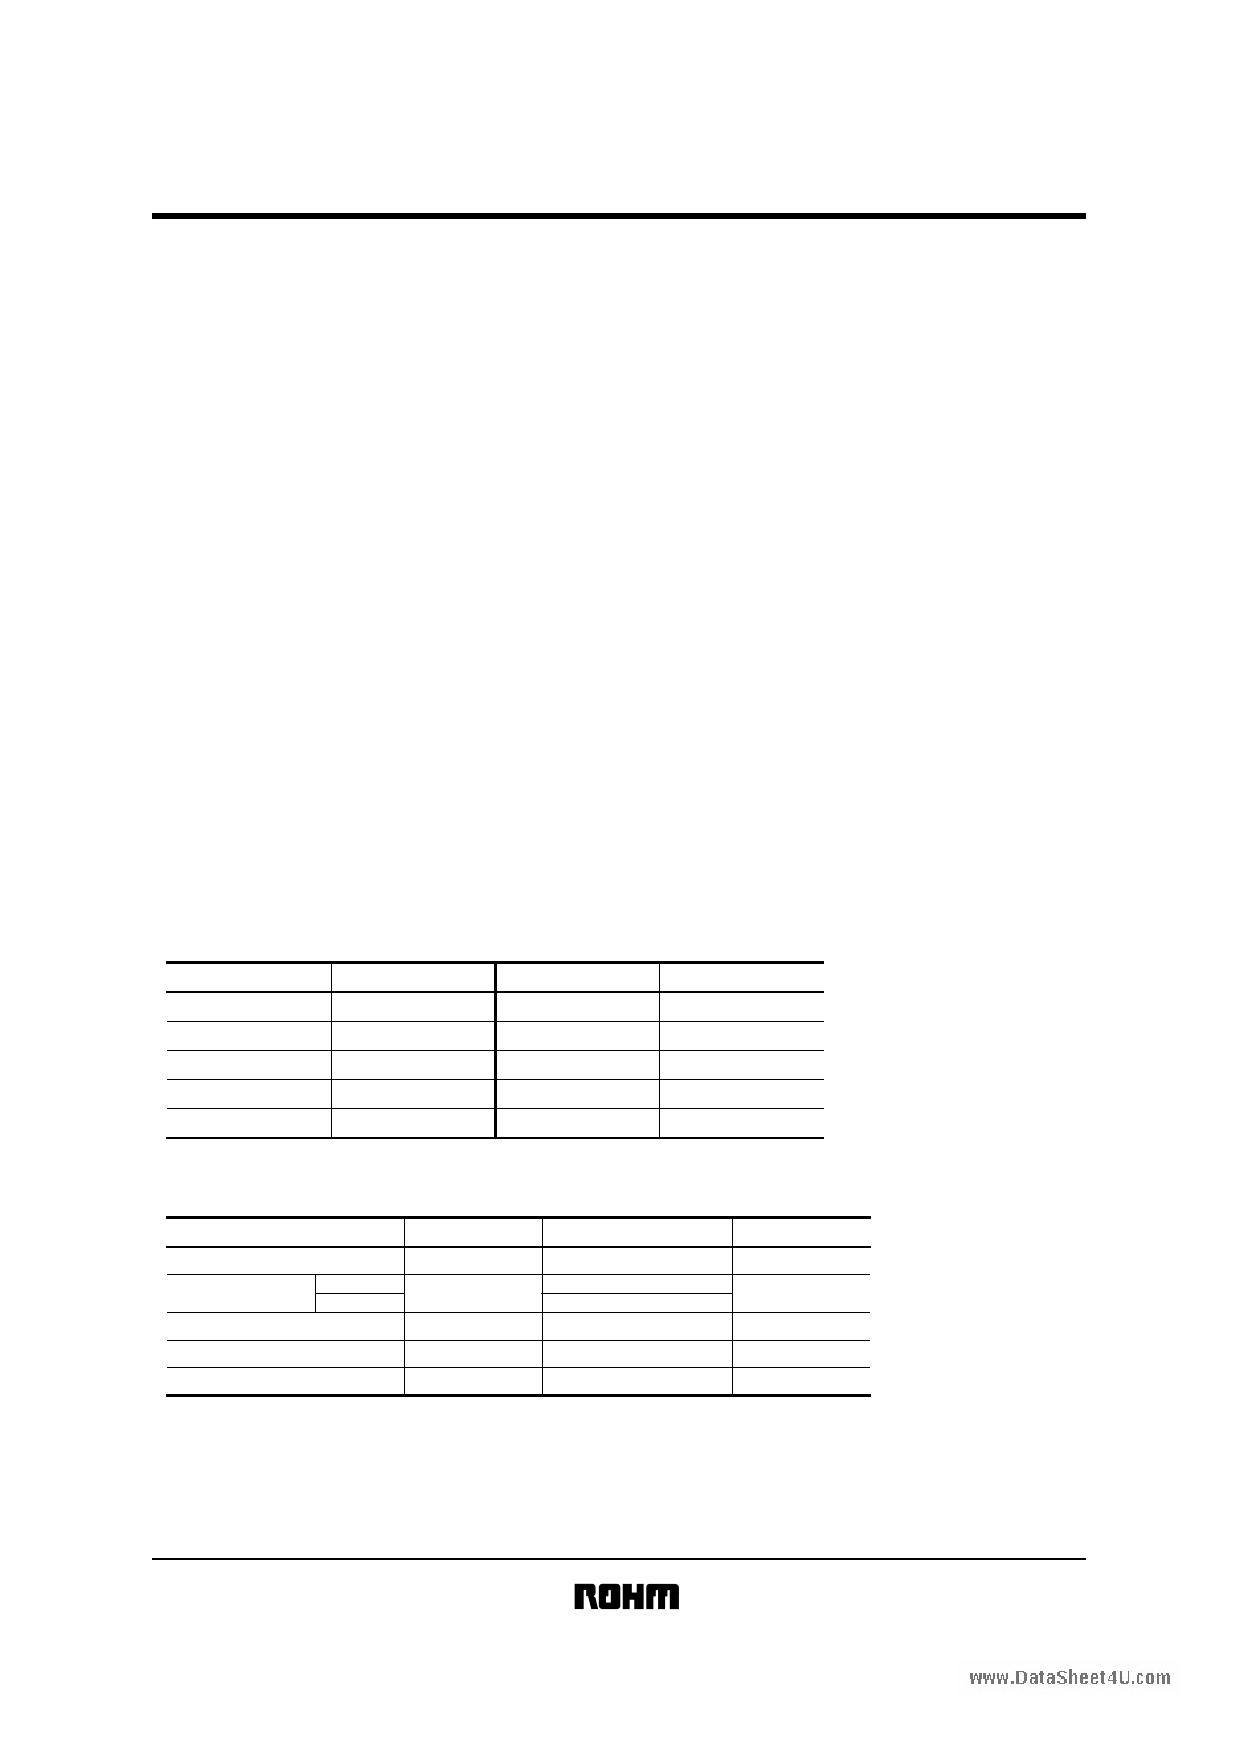 BA06SFP datasheet